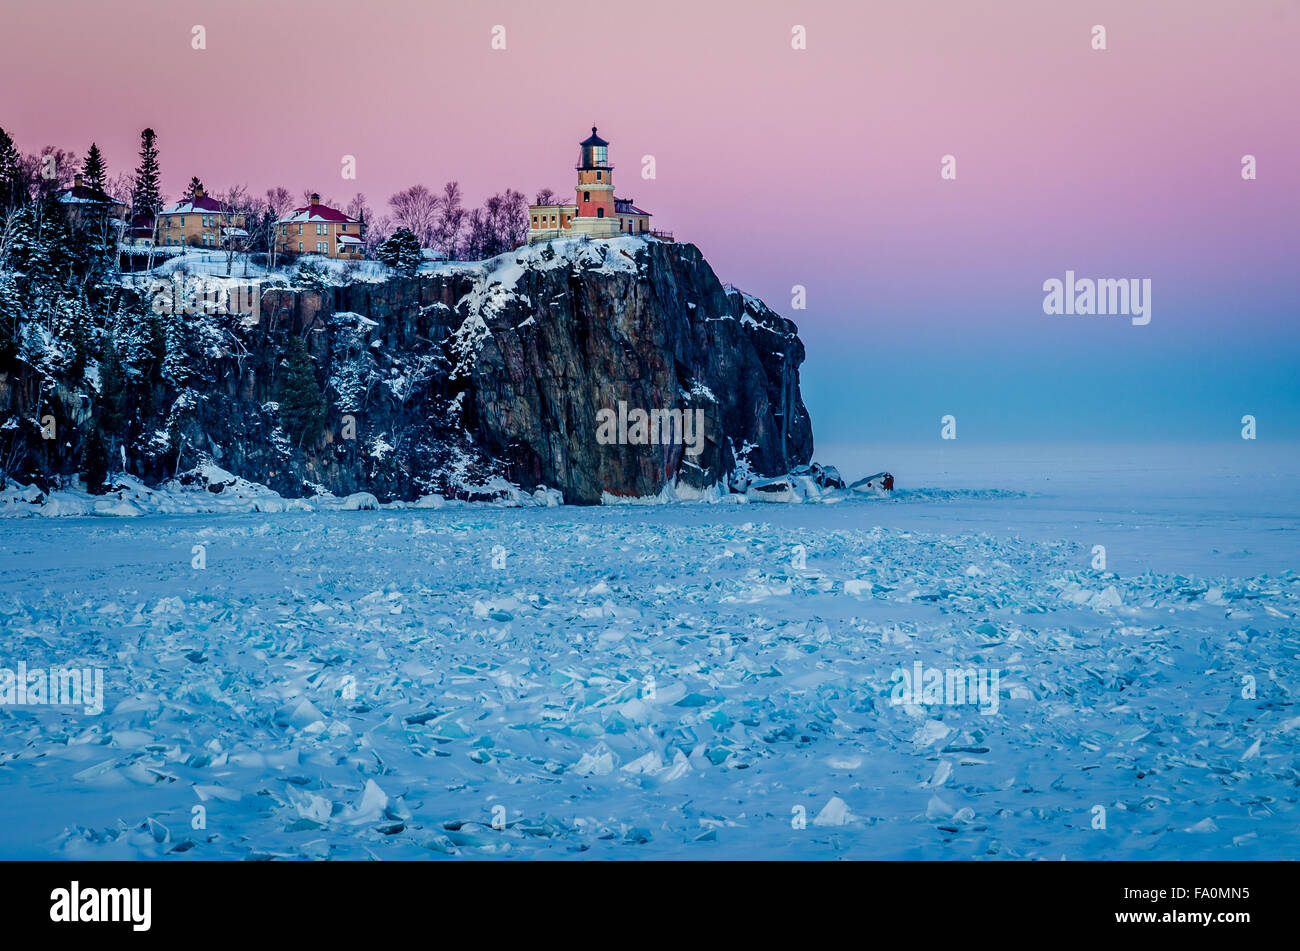 Split Rock Lighthouse, Minnesota - Stock Image